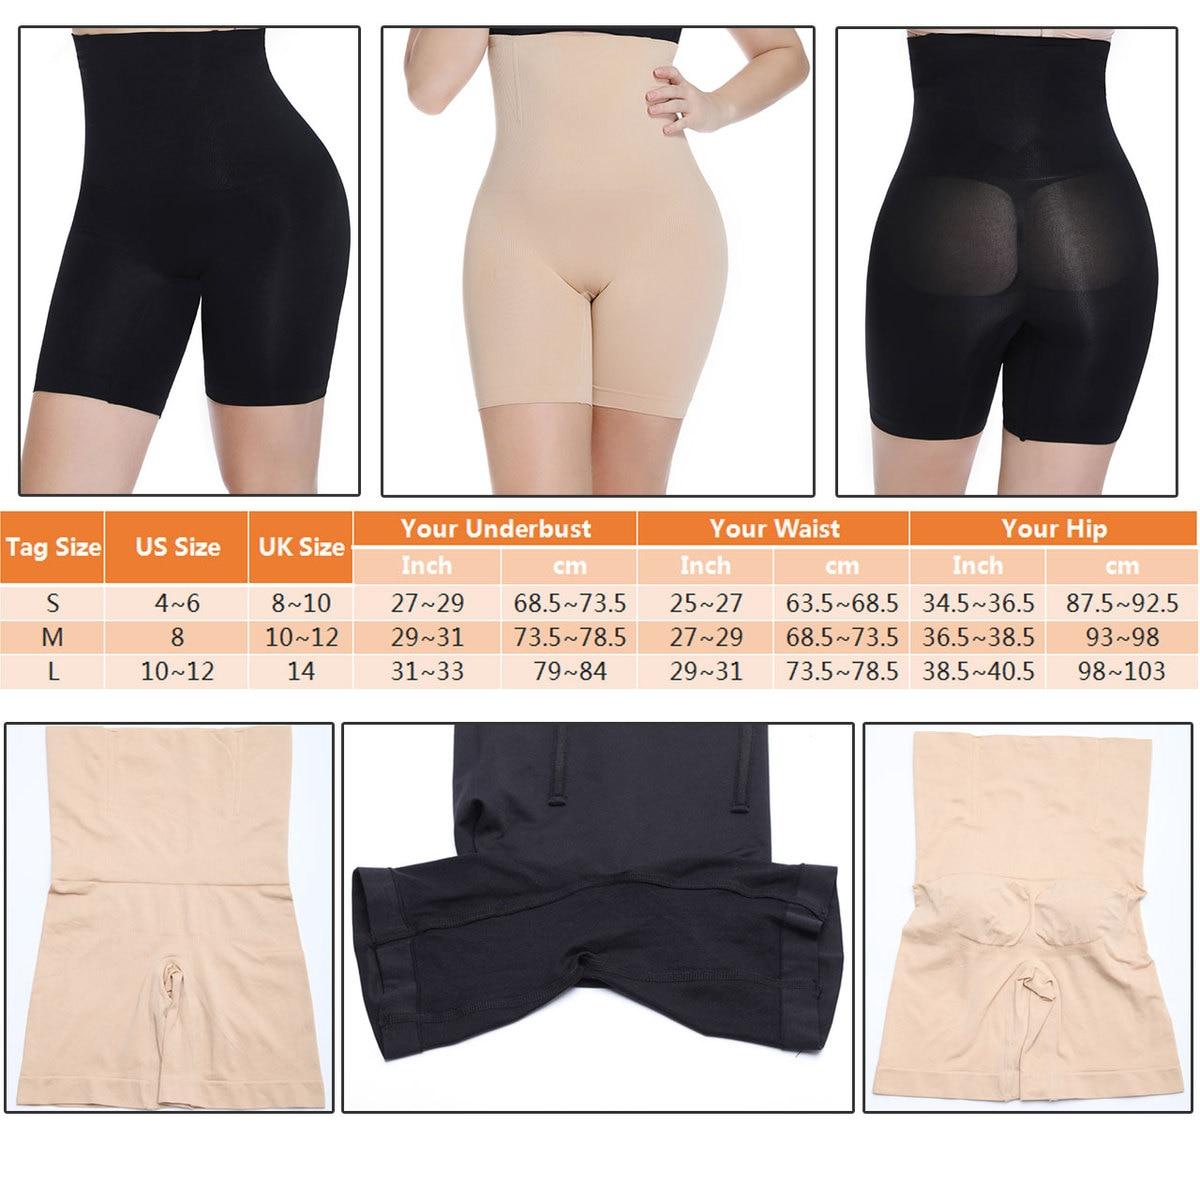 Womens Tummy Trimmer Instant Slimming Belt Girdle Body Shapers UK 8-10